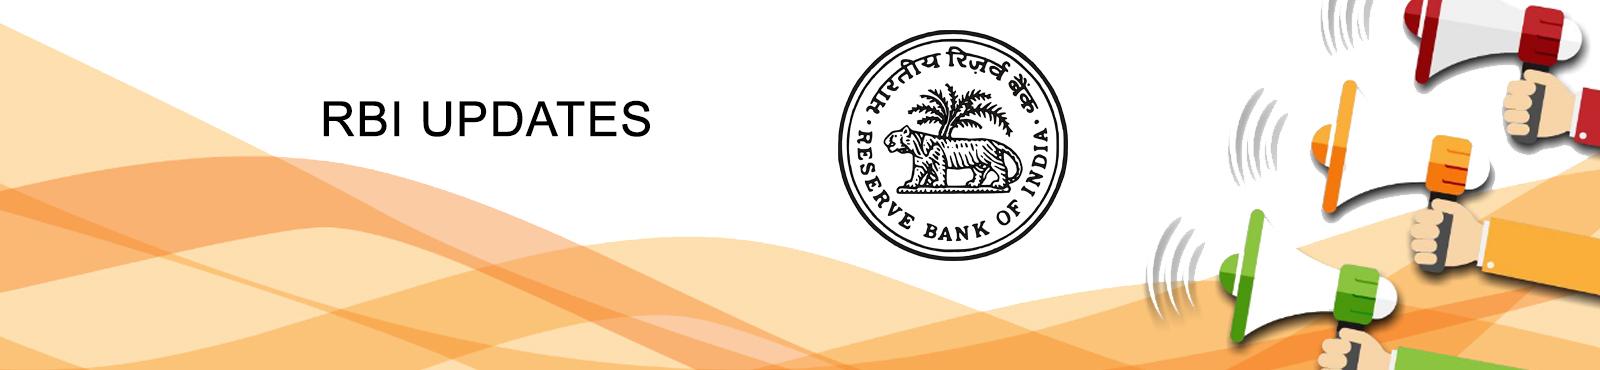 RBI Updates Banner